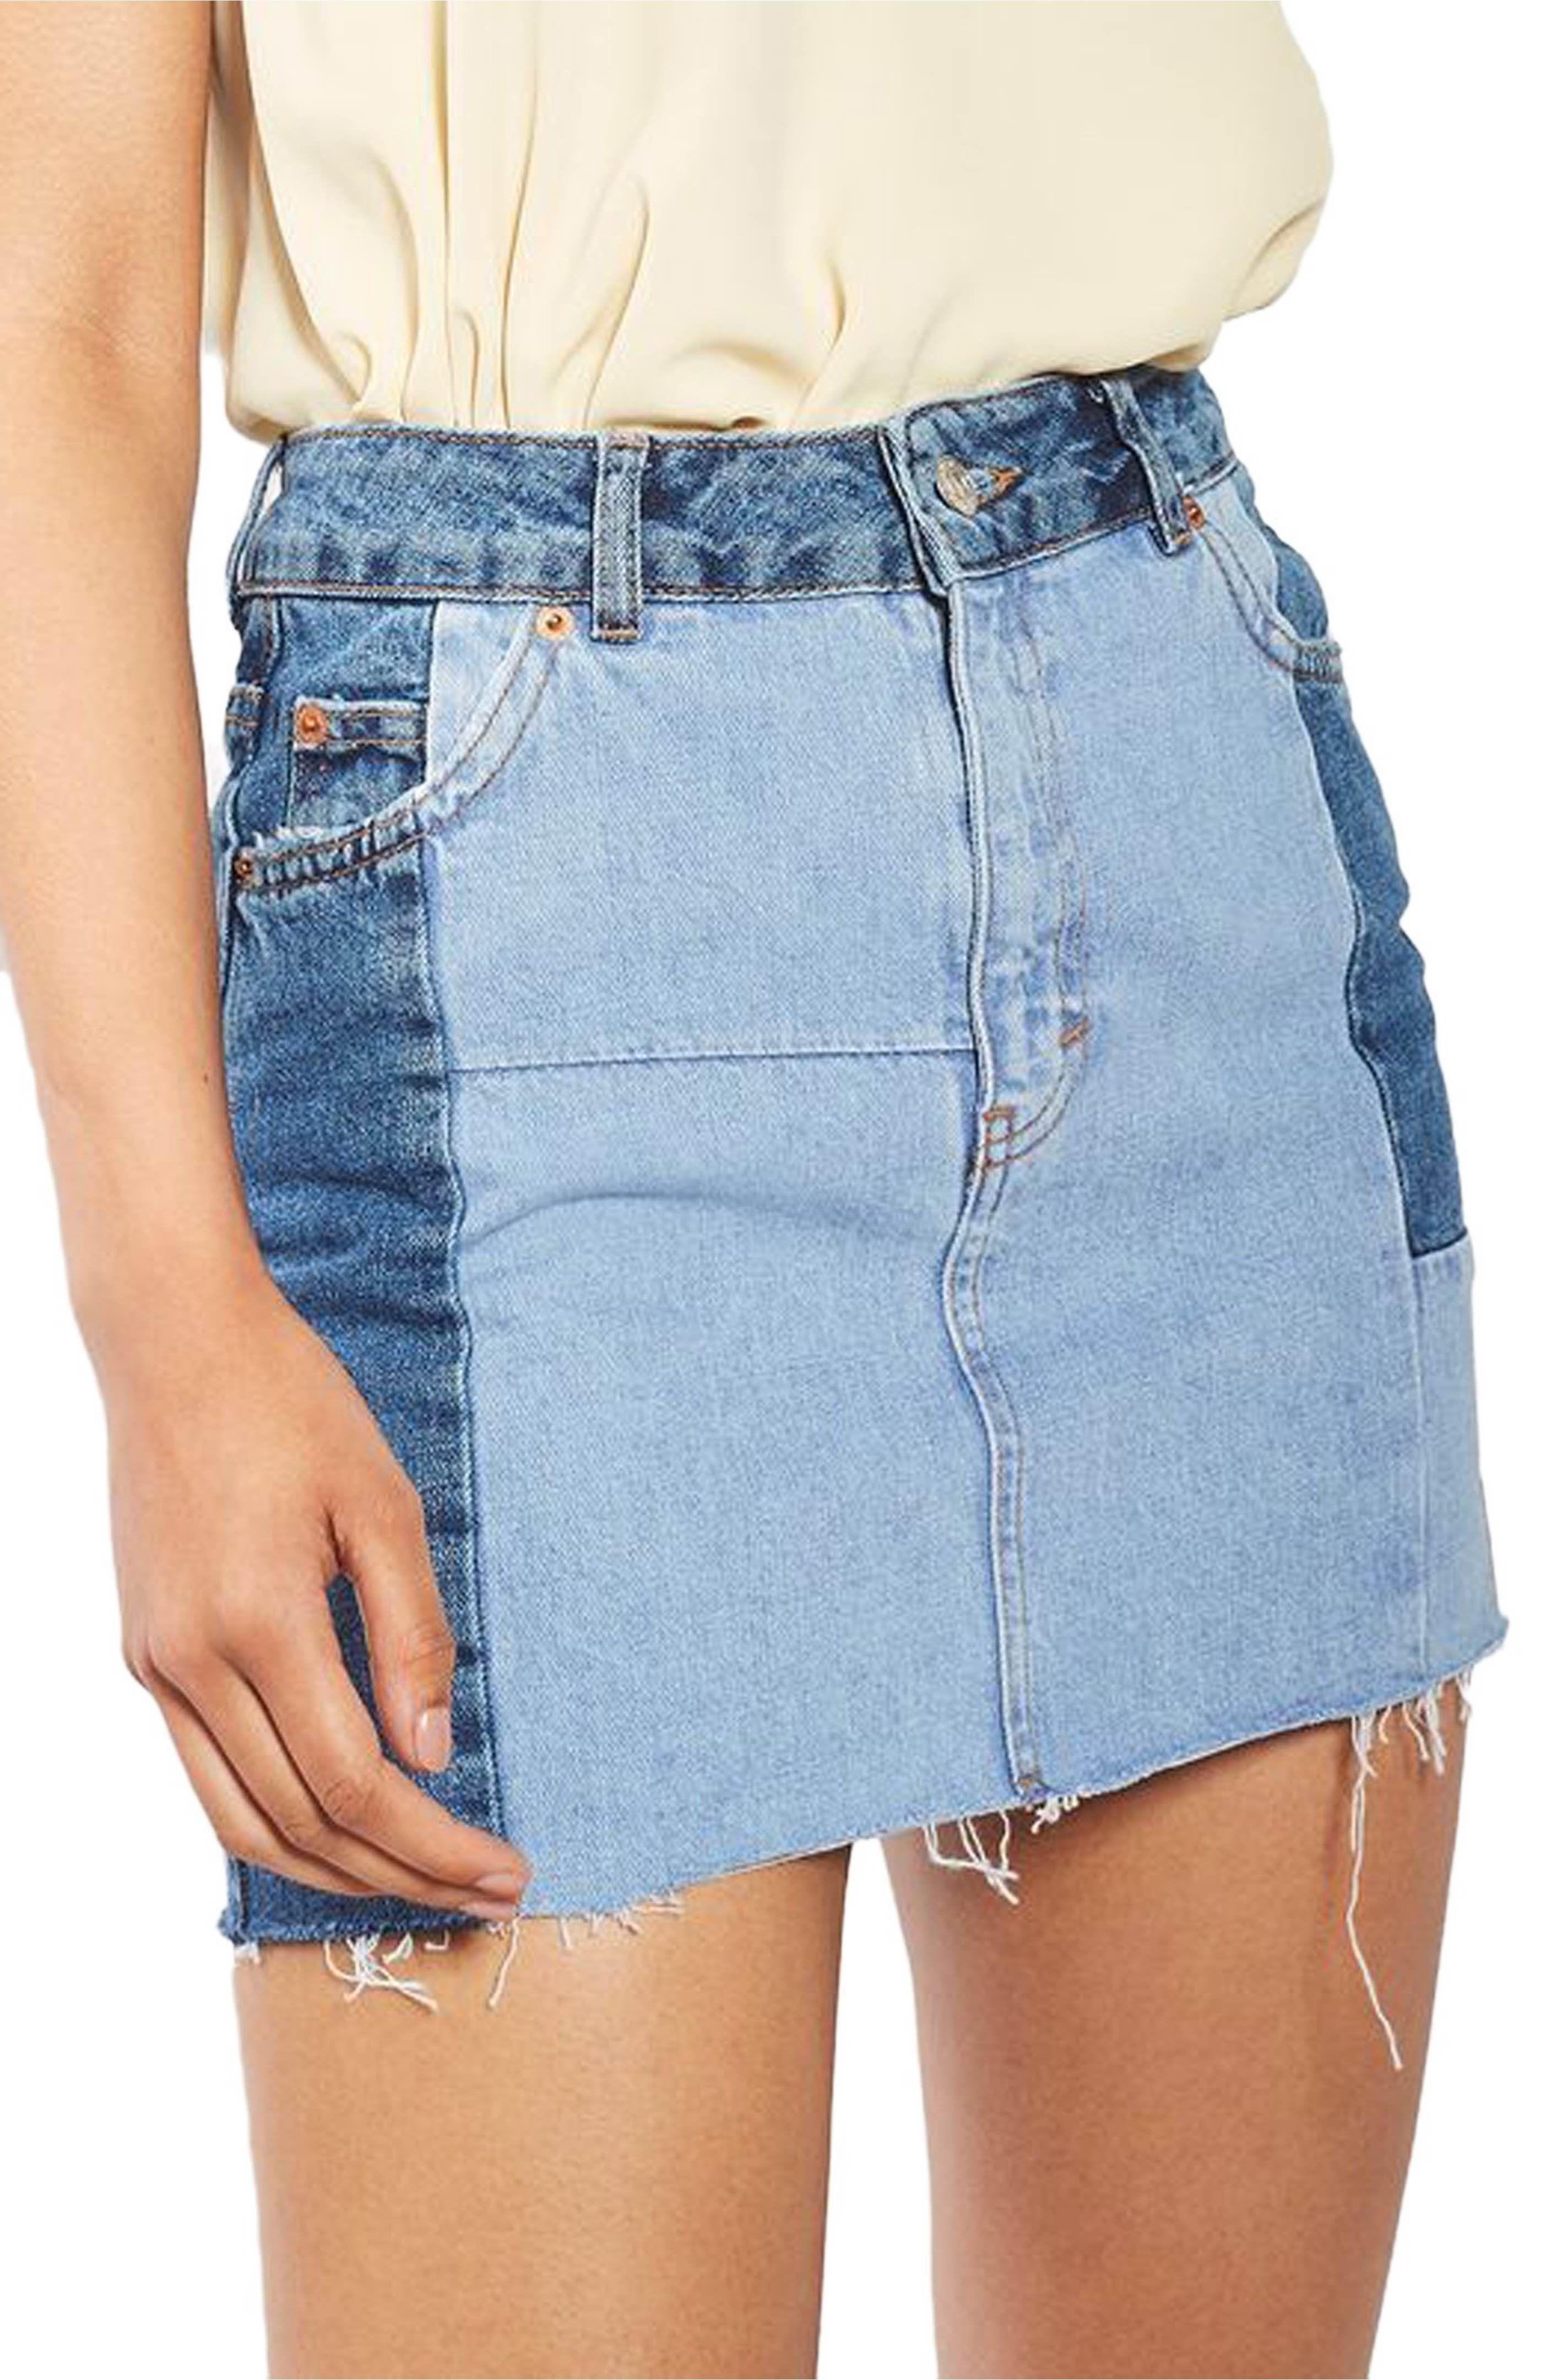 8754fe8338 Main Image - Topshop Colorblock Denim Miniskirt | clothing → in ...